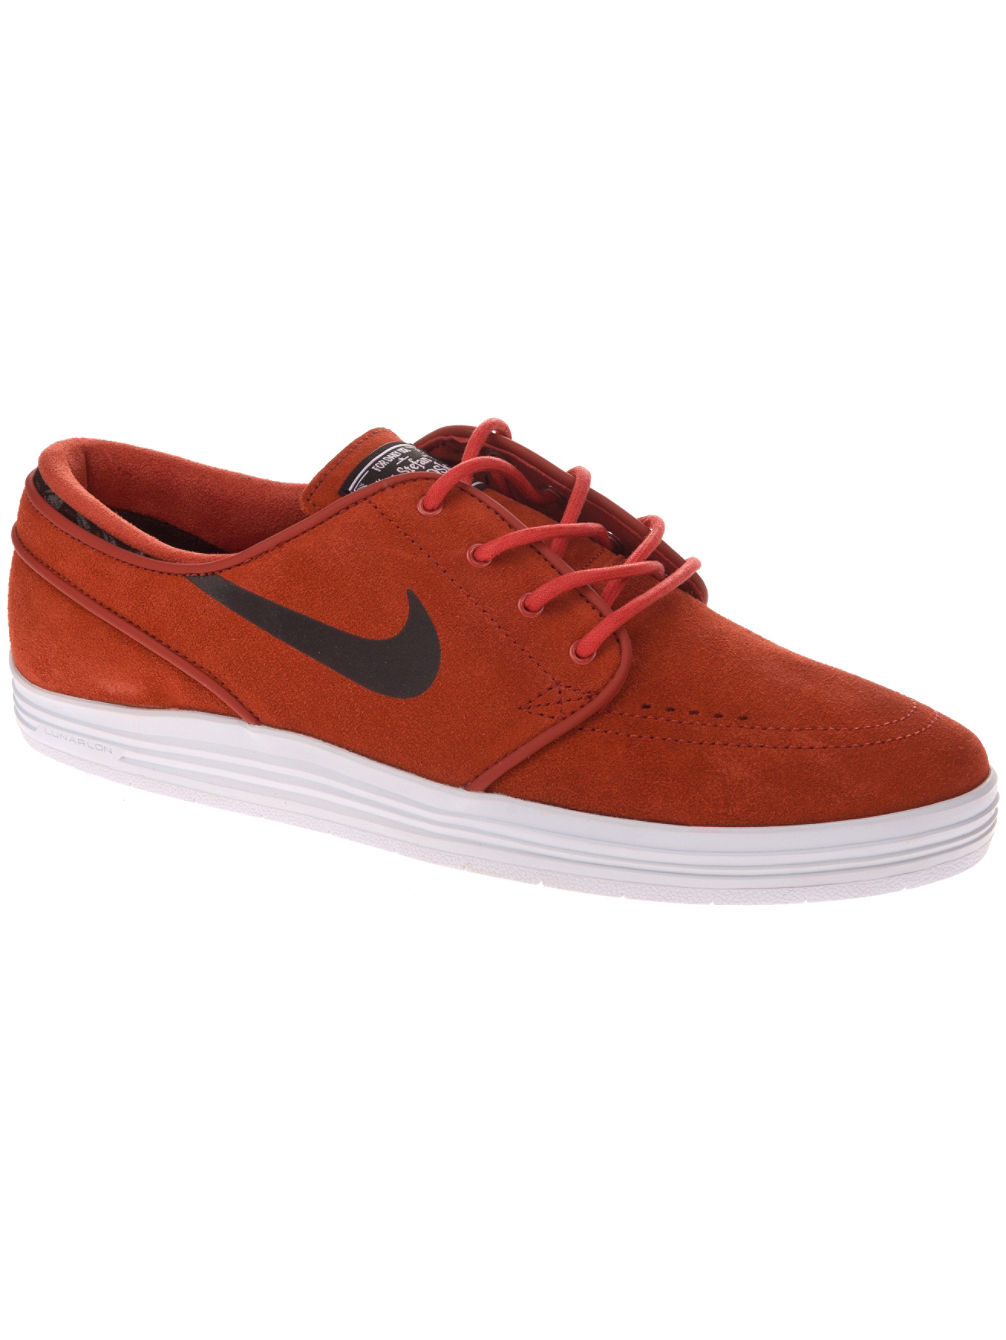 Nike Lunar Stefan Janoski Skate Shoes - nike - blue-tomato.com